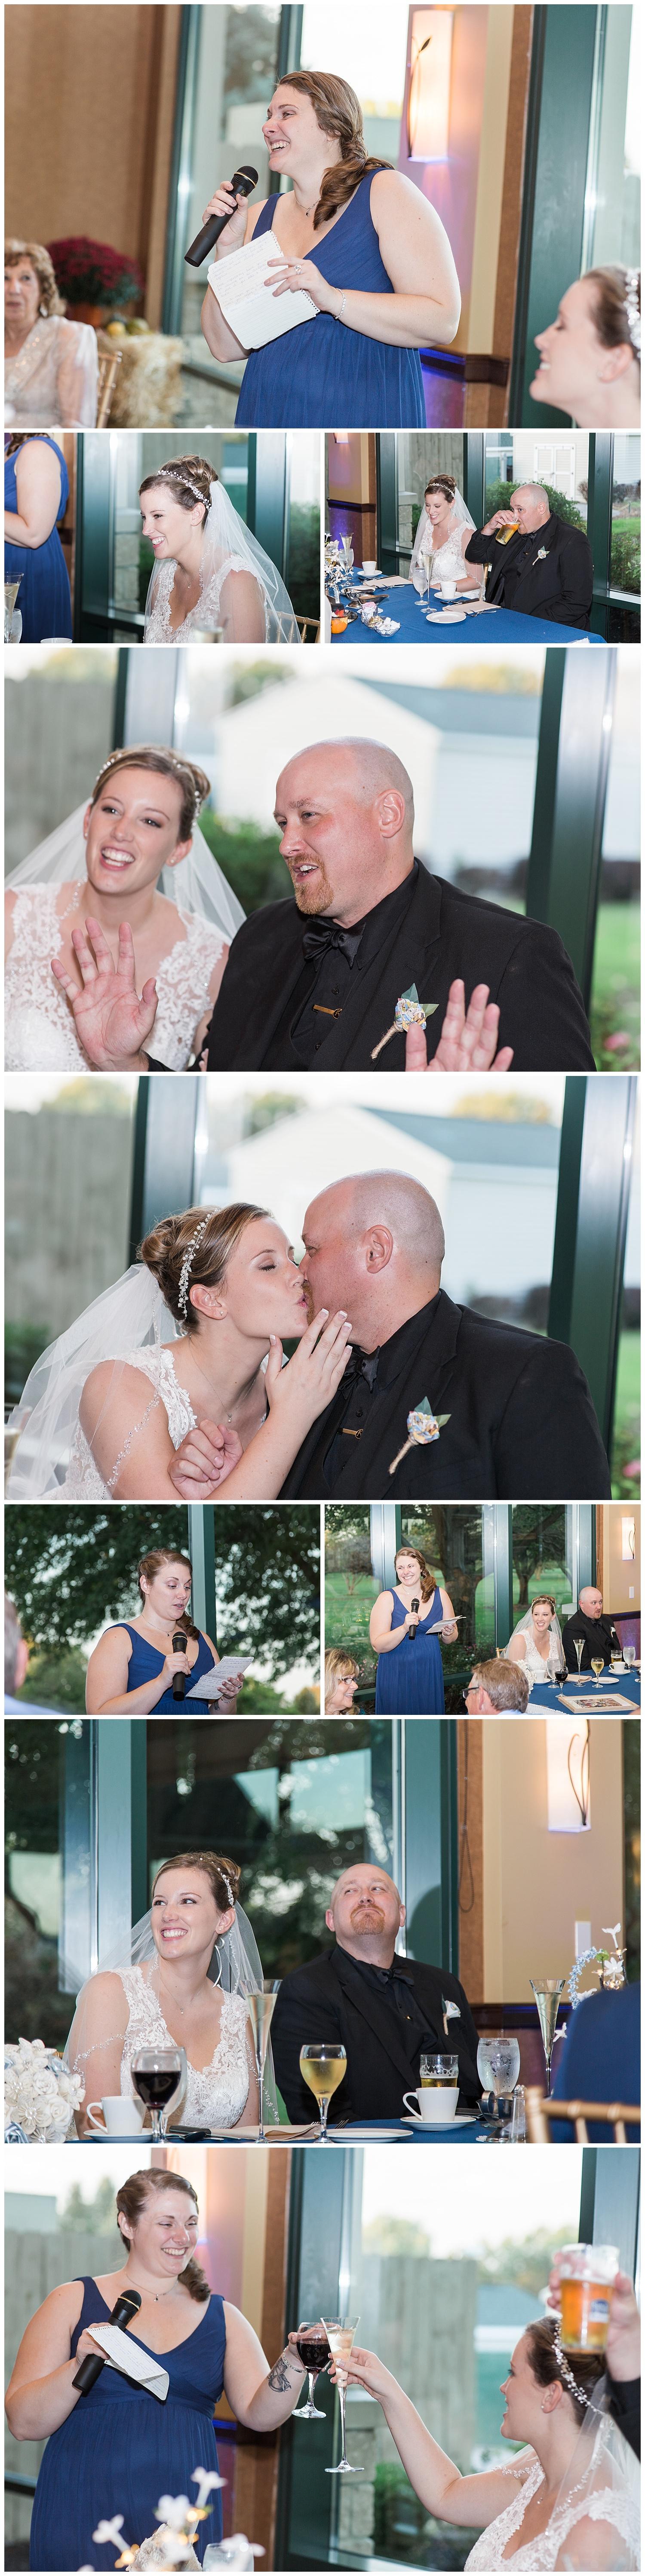 Jessica and Scott McKay - Terry Hills Golf Course - Batavia NY - Lass and Beau-1016_Buffalo wedding photography.jpg